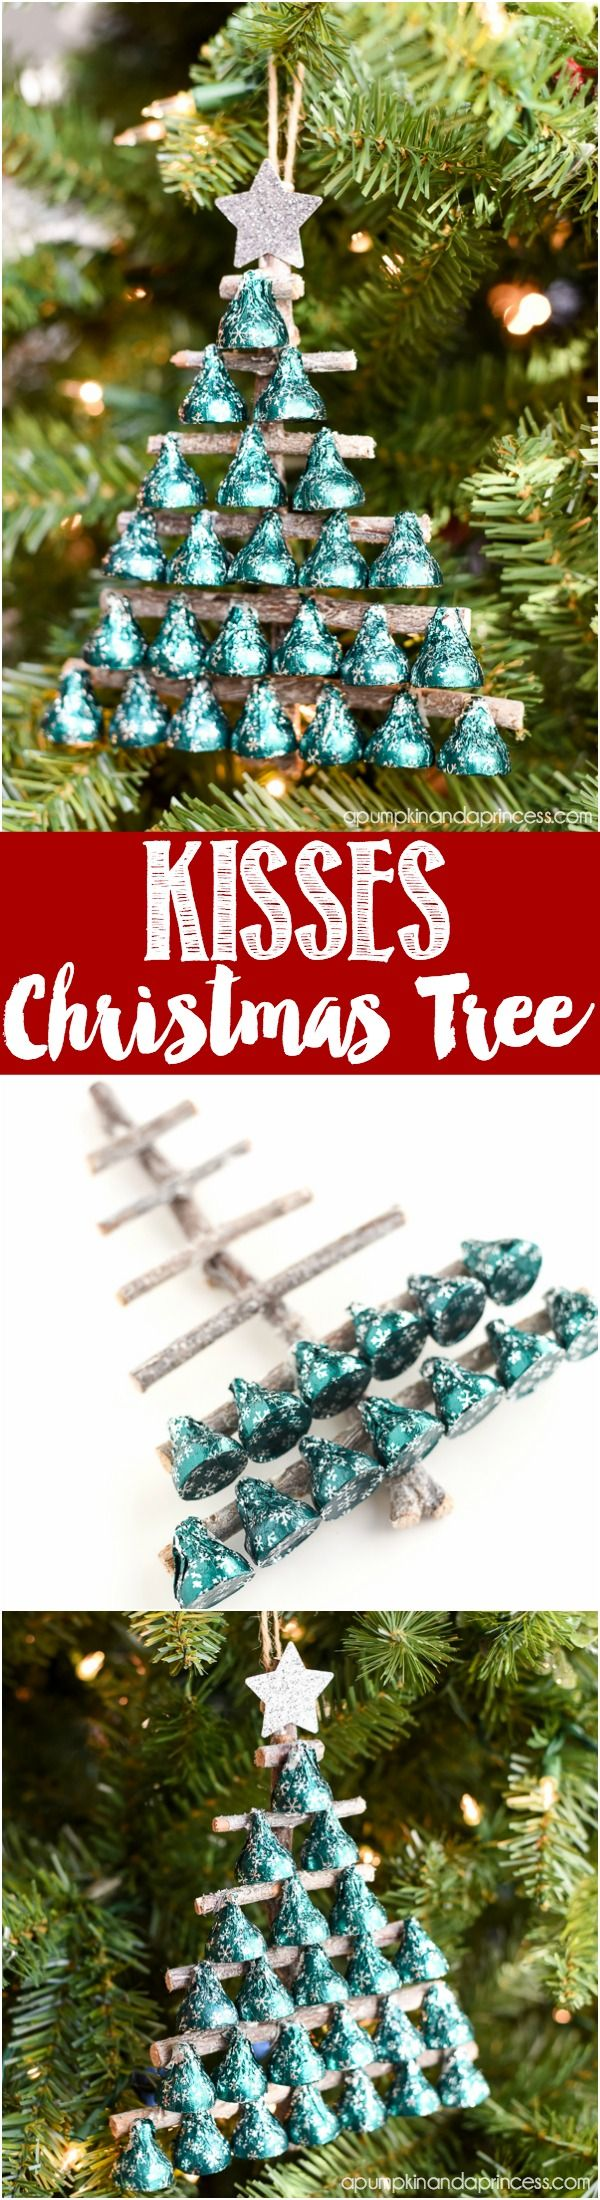 Christmas DIY candy Hershey's Kiss ornament